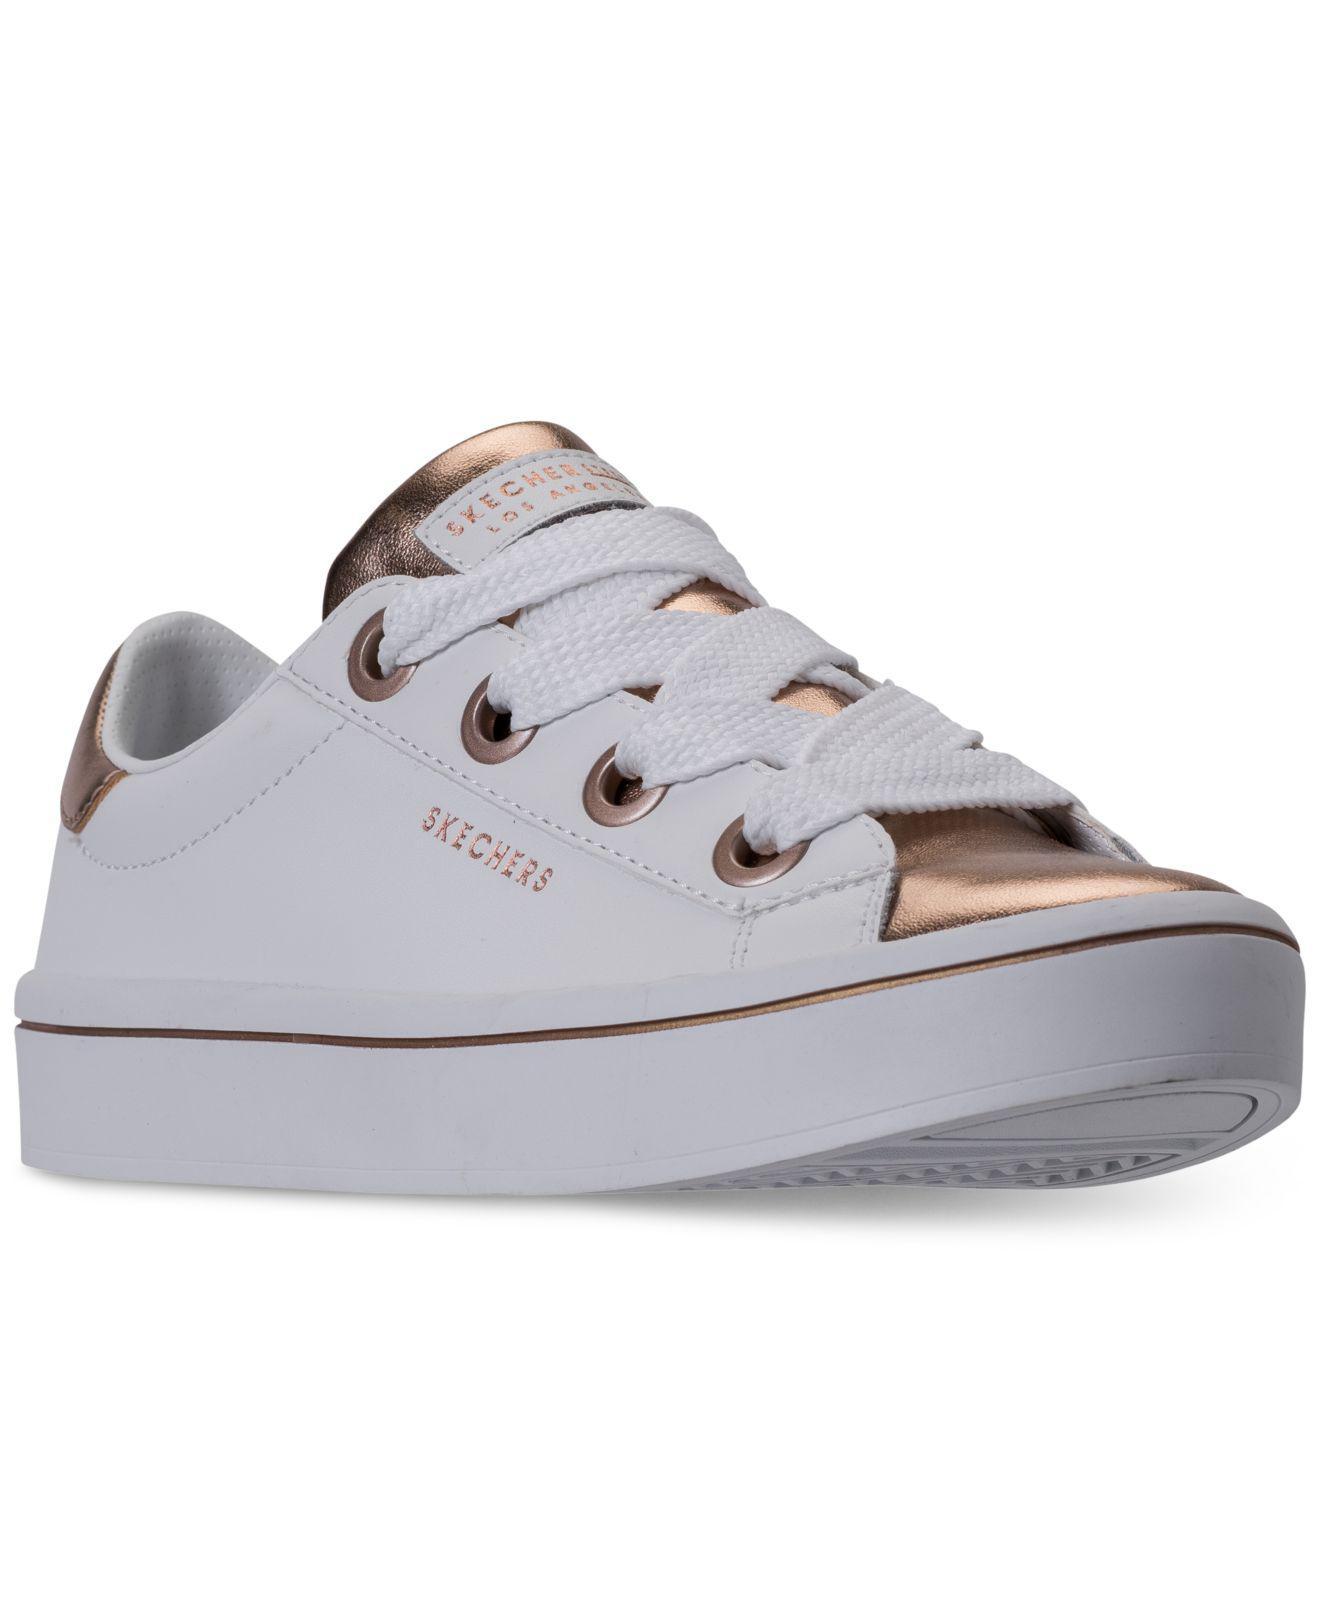 22a3de579af9 Lyst - Skechers Women s Hi-lites - Medal Toes Casual Sneakers From ...